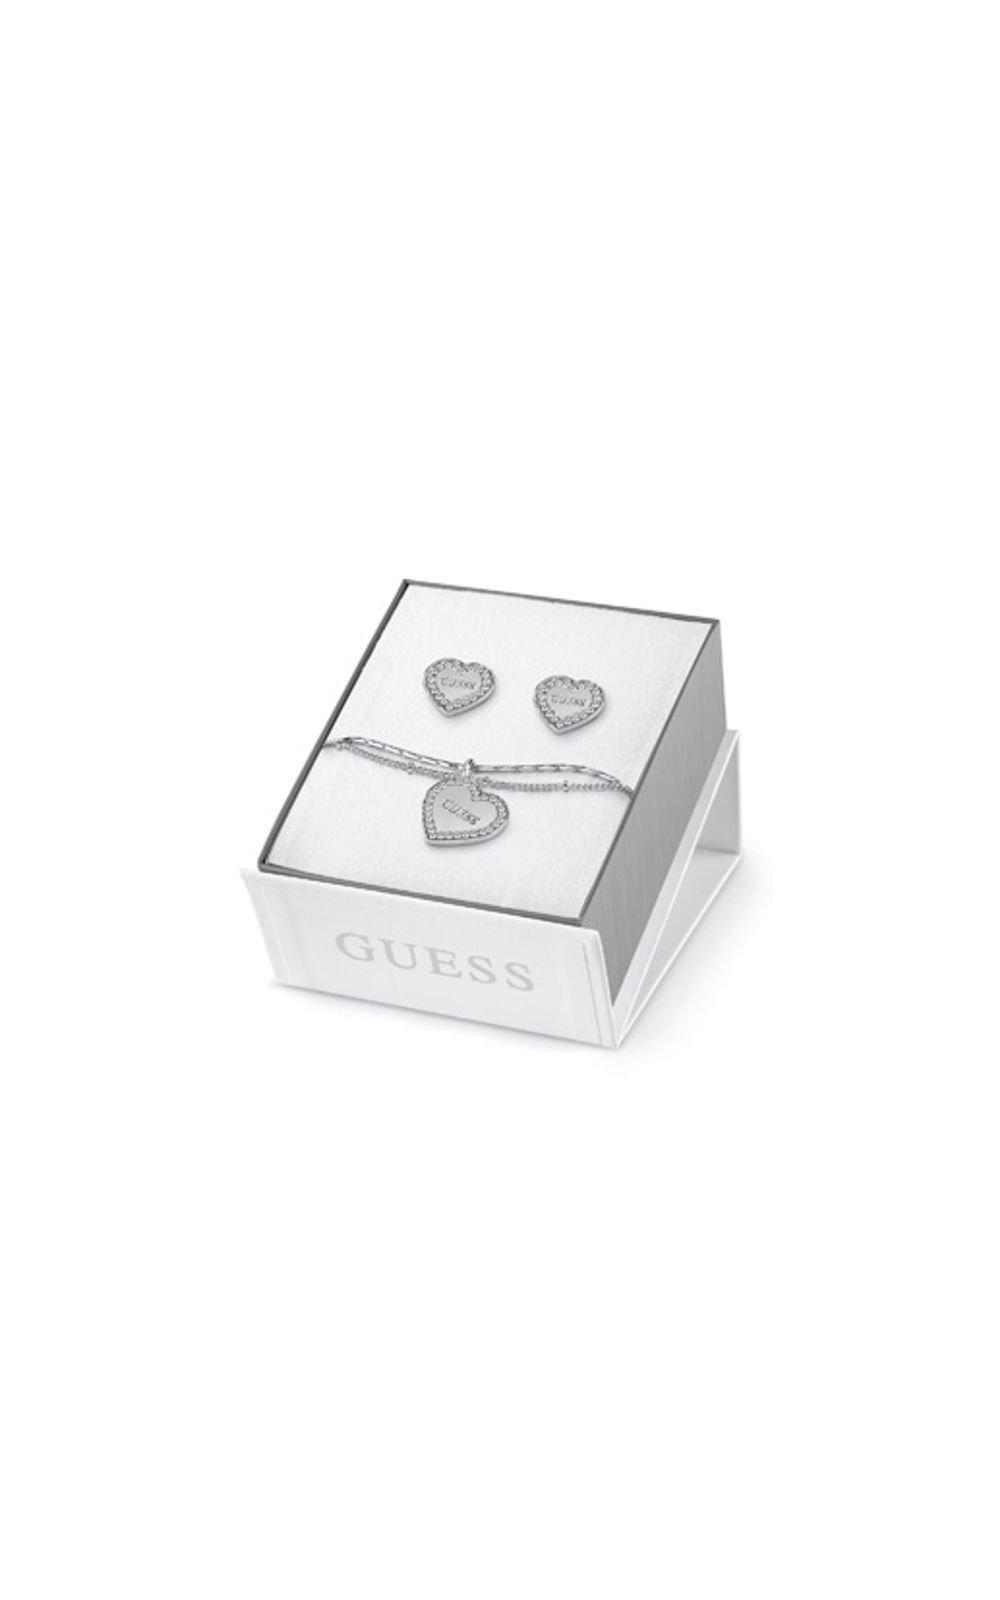 GUESS FAUX UBS84039-L Σετ Ασημένιο Βραχιόλι Και Σκουλαρίκια